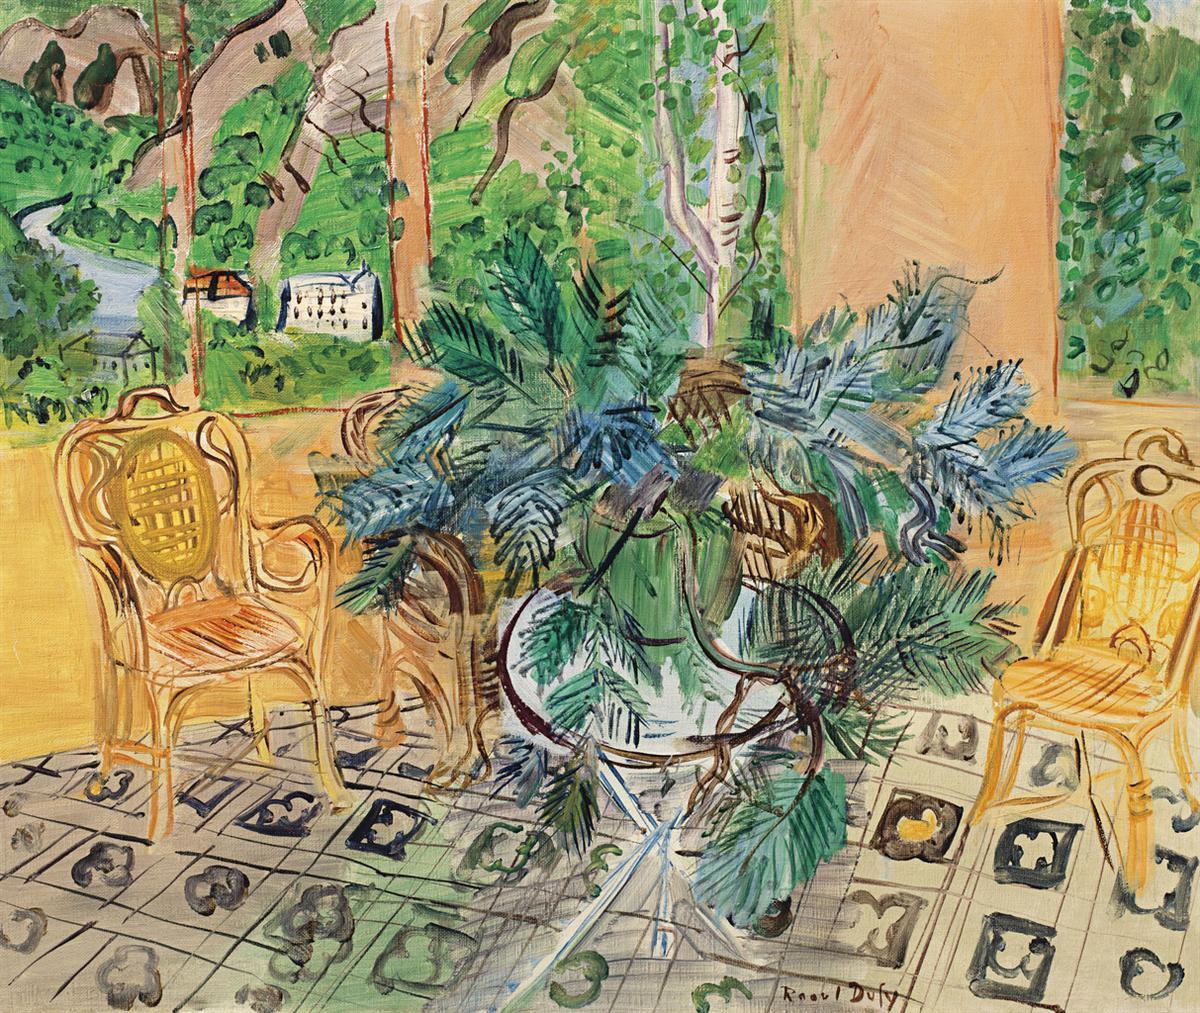 Raoul Dufy-La Terrasse A Vernet-Les-Bains-1943